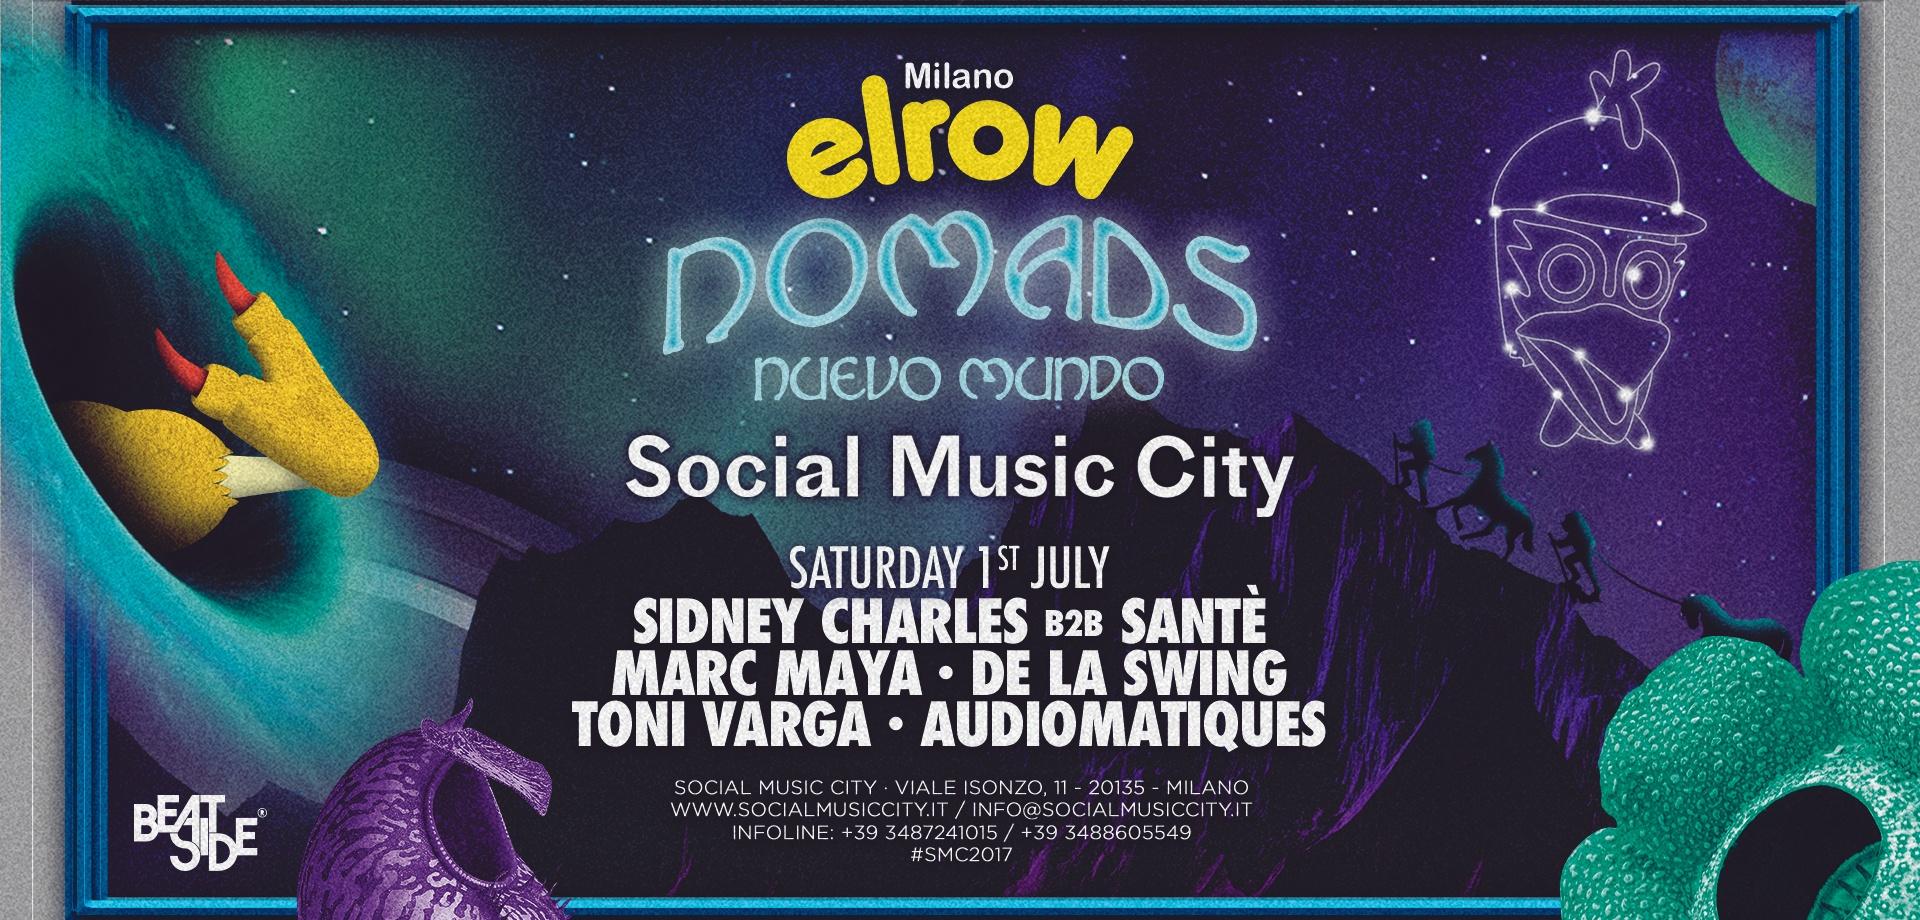 Social music city - nomads, new world